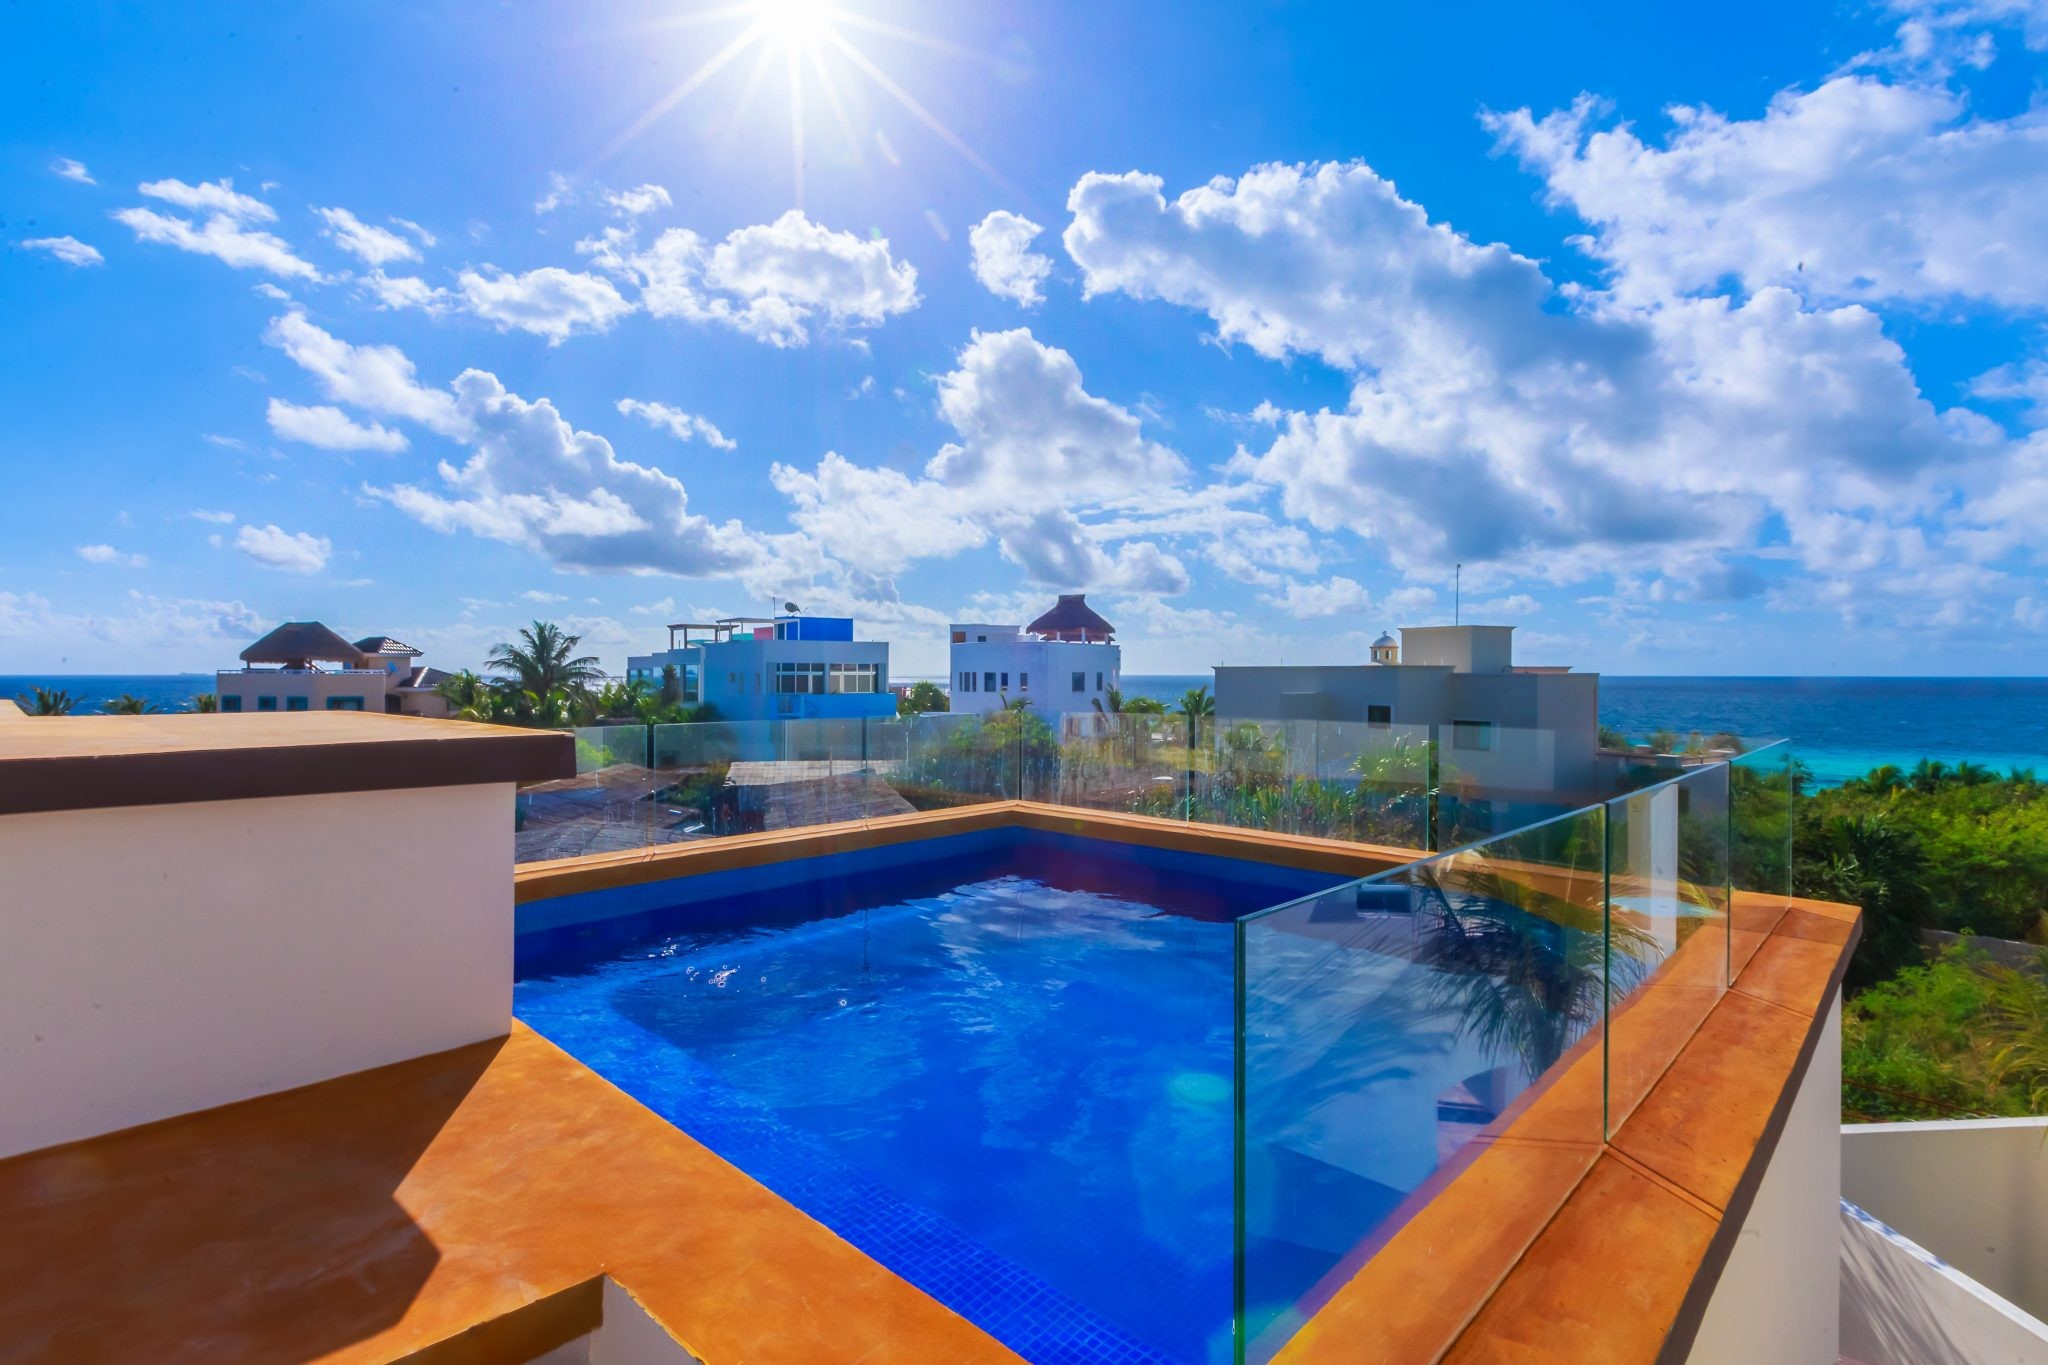 Isla Mujeres Vacation Rental Heated Pool Casa Elegante